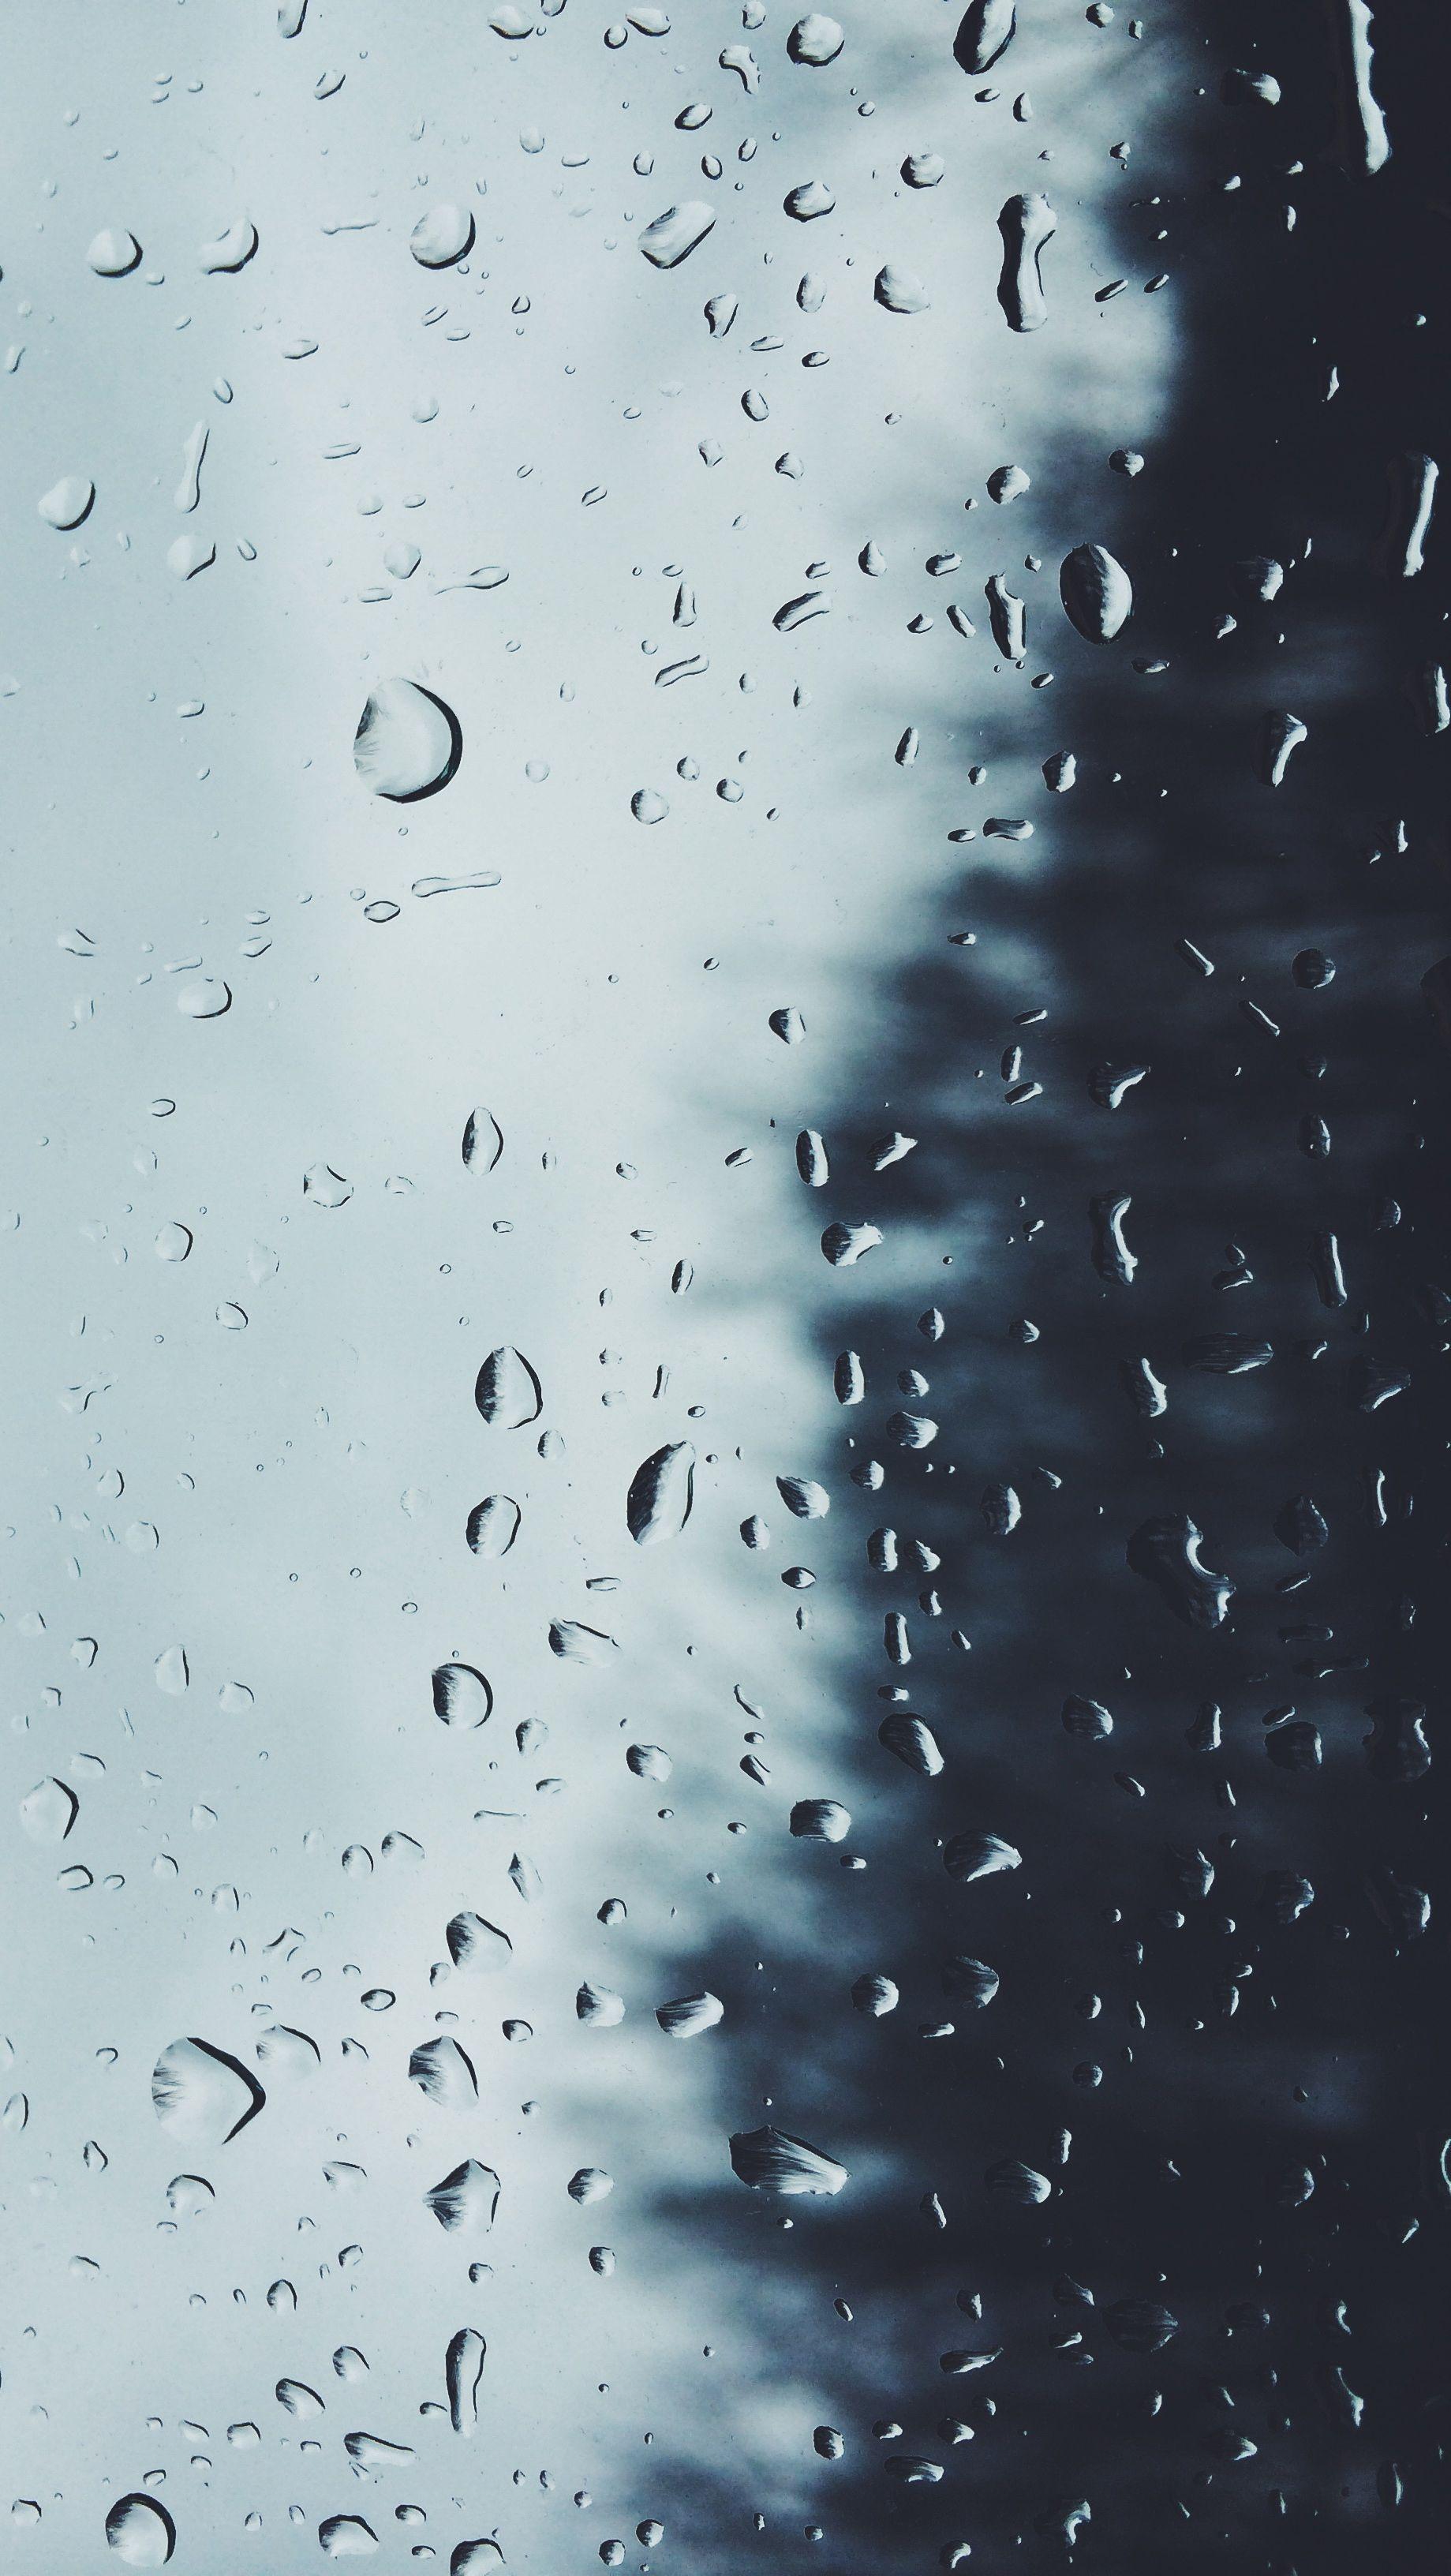 Rainy Windows Will Vastine Photographer Adventurer